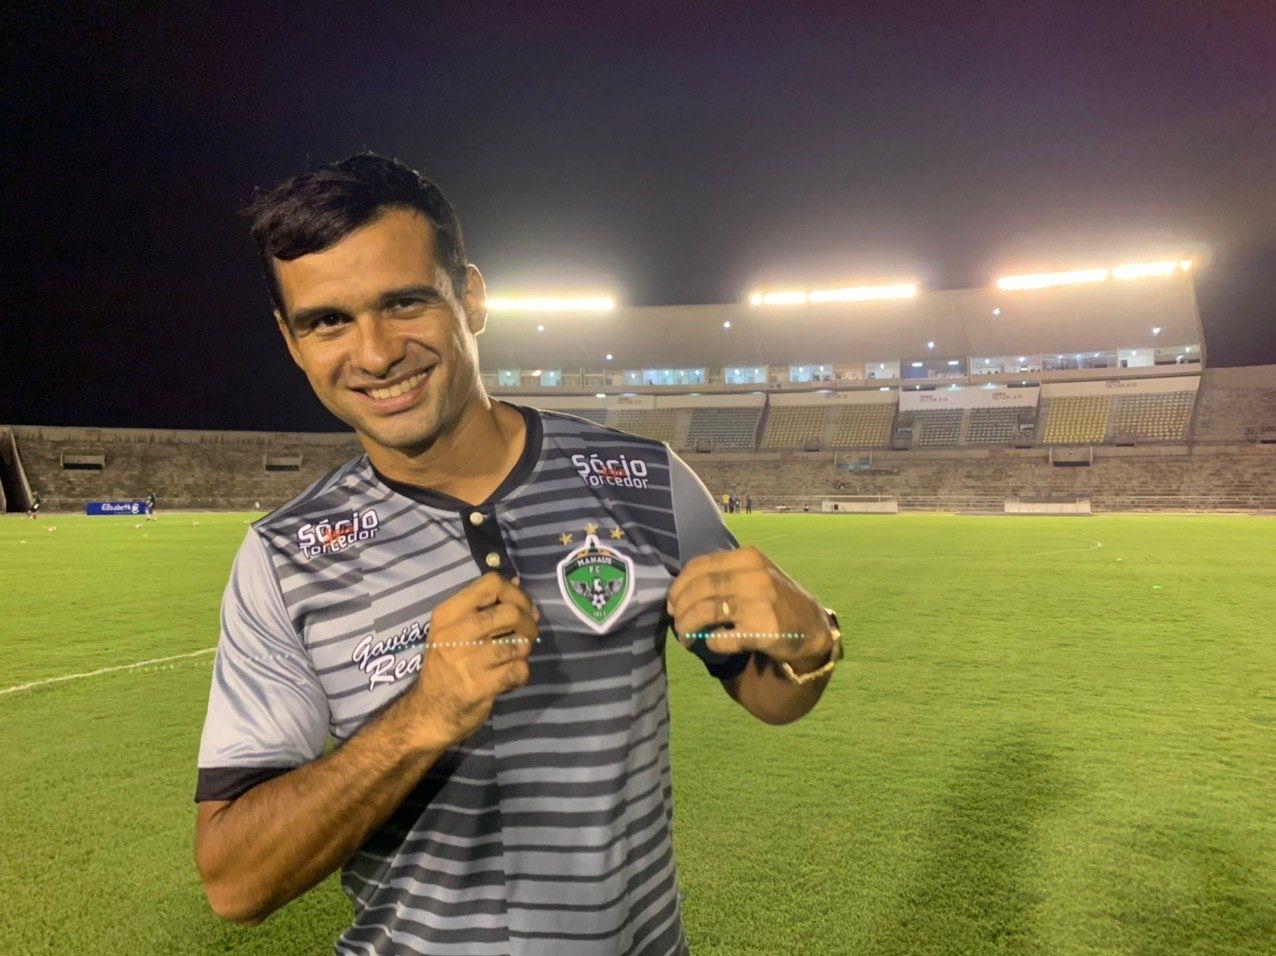 Torcedor Brunno Souza Manaus FC